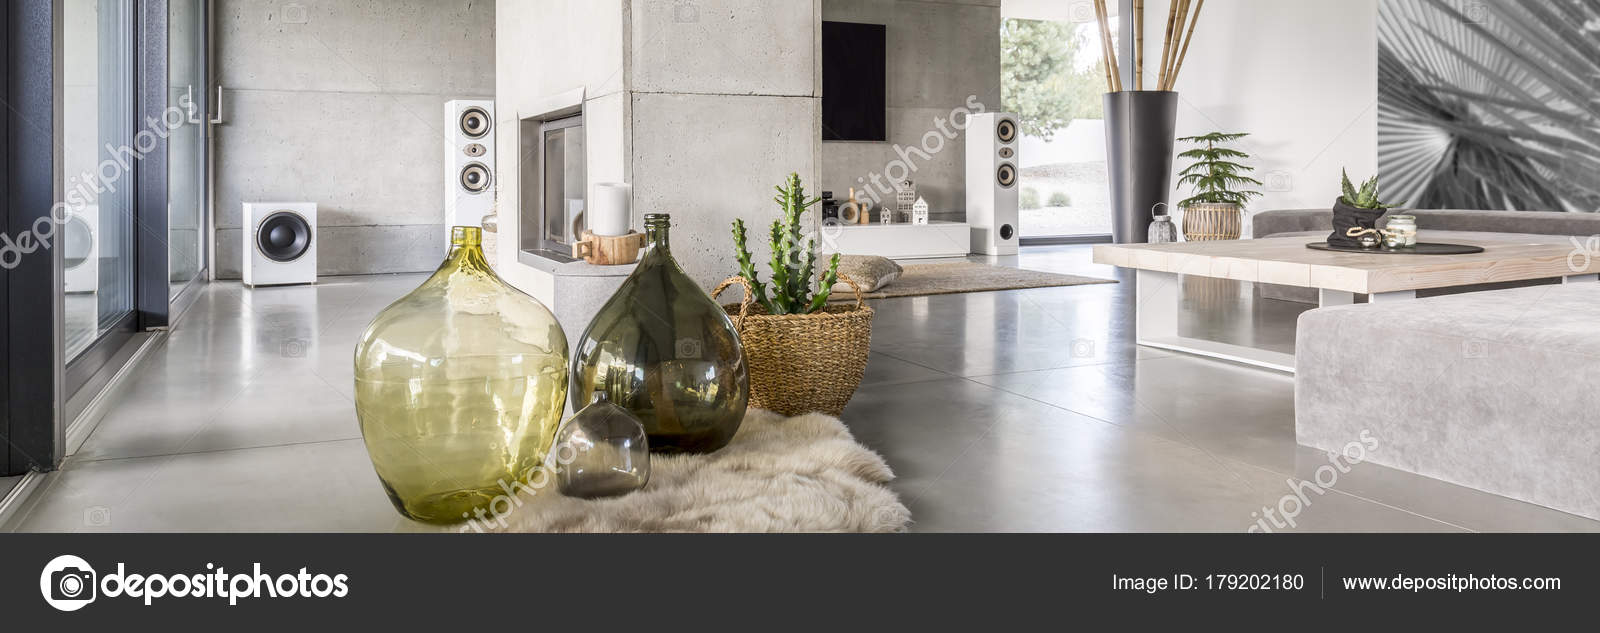 Dekorative Wohnzimmer — Stockfoto © photographee.eu #179202180